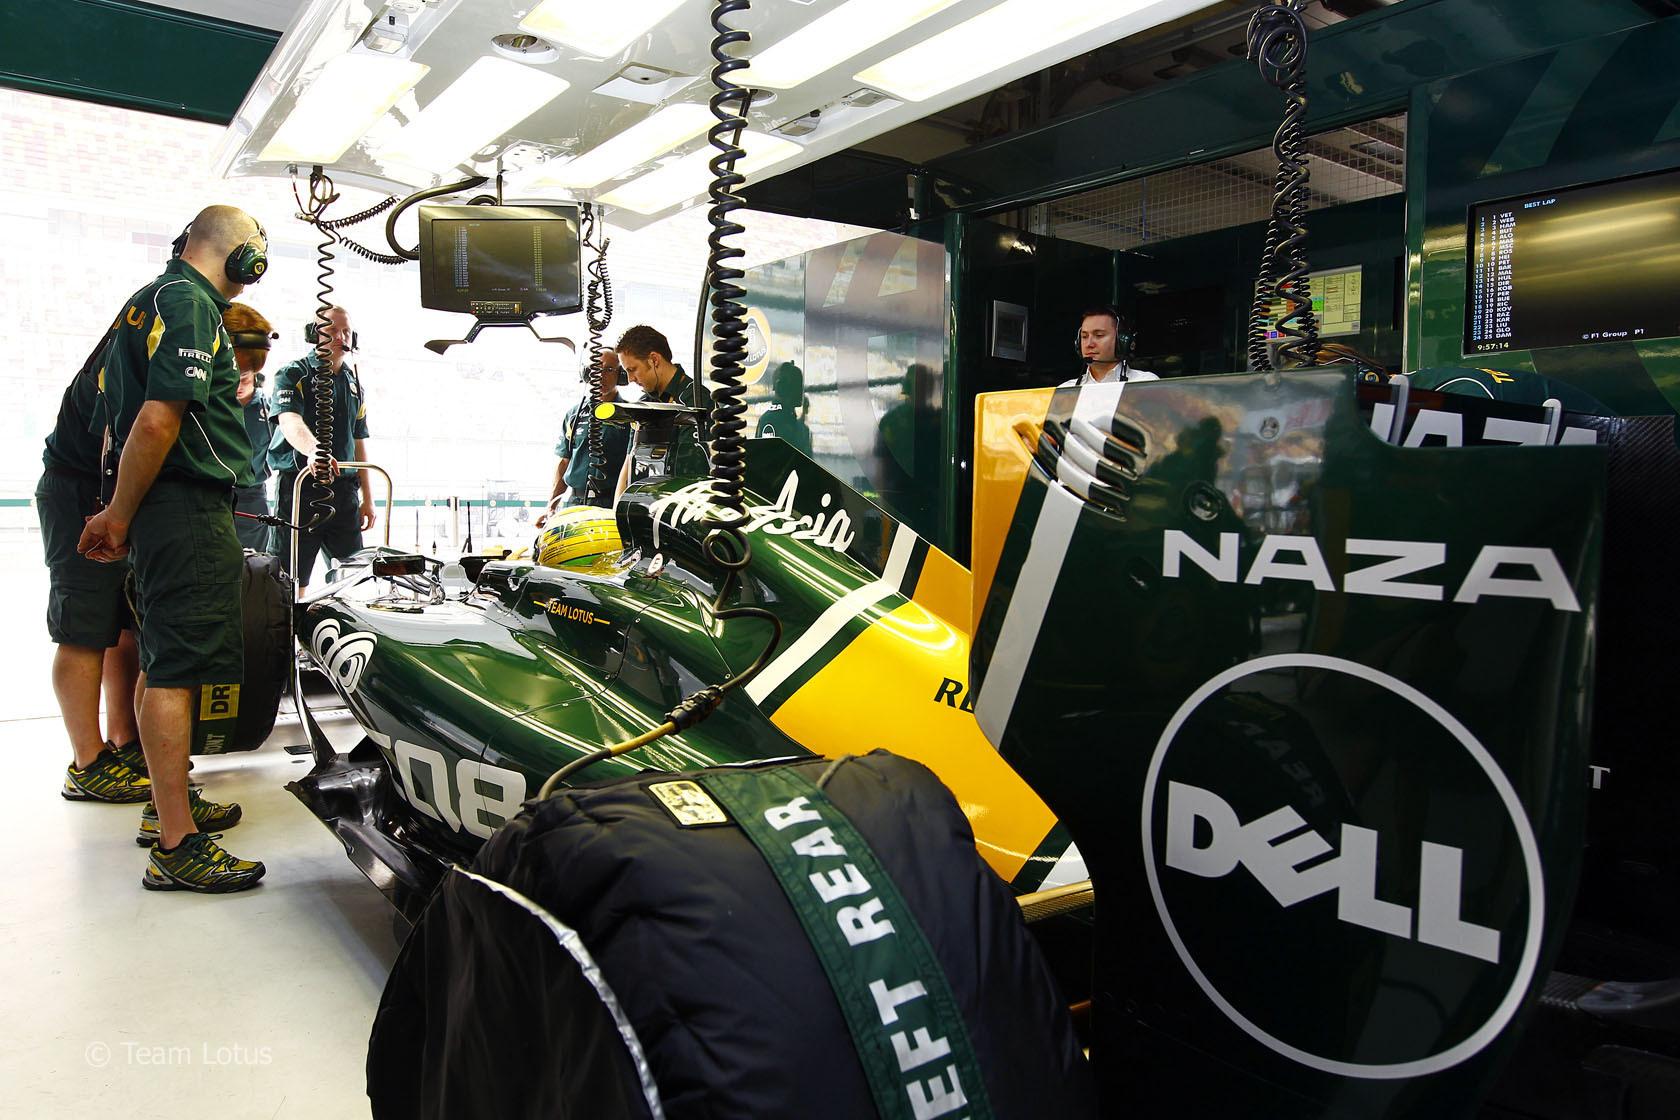 Team Lotus Formula 1 Images Dell New Sponsor Hd